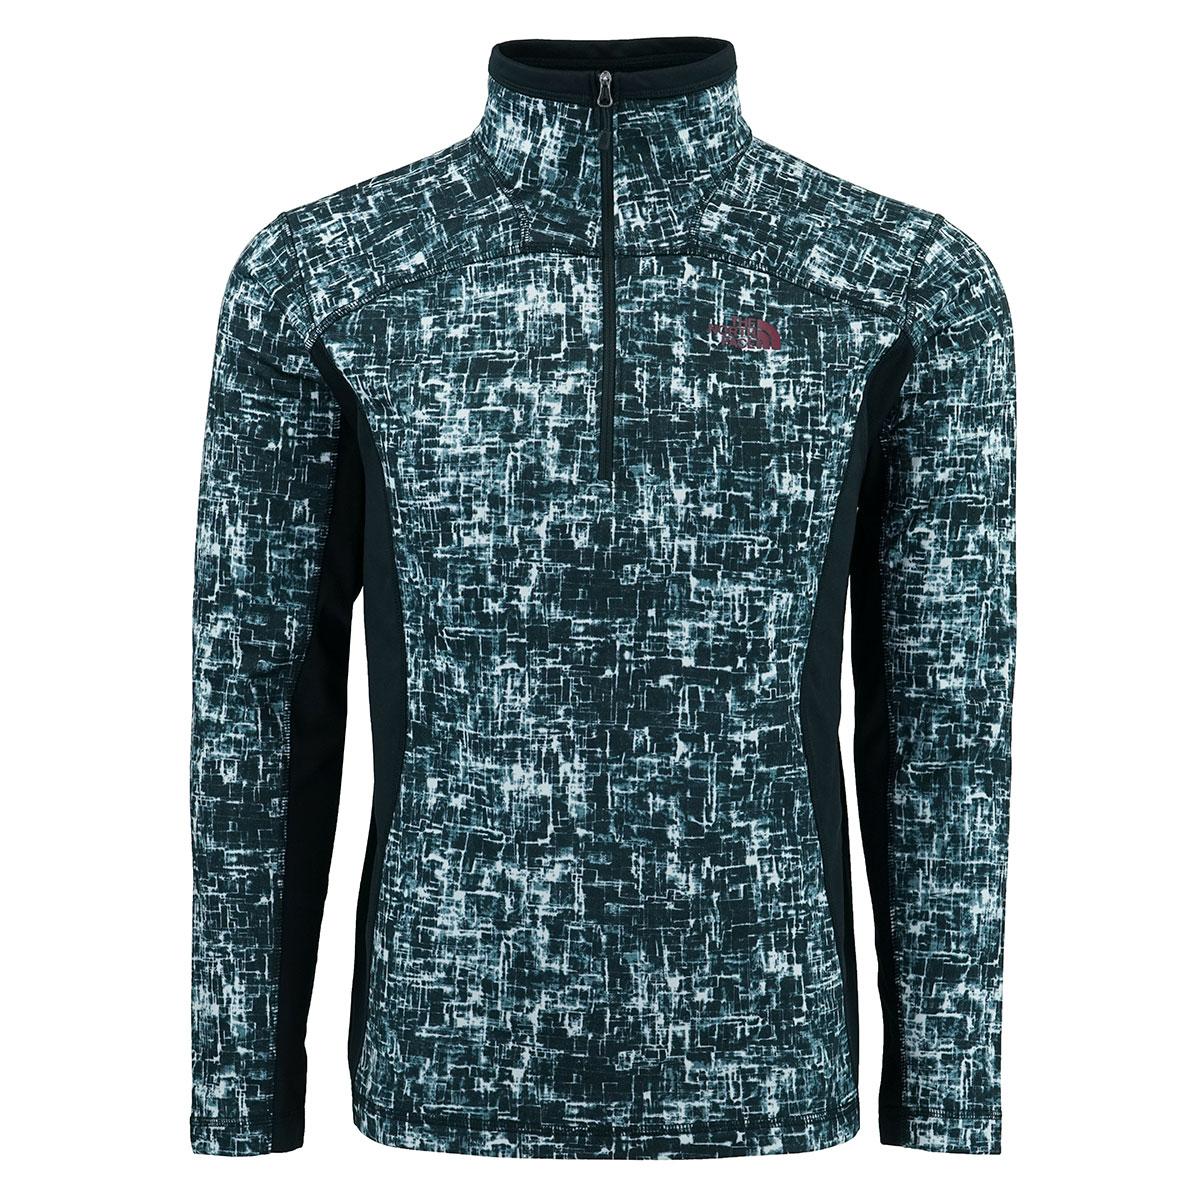 Blackwhite Cinder Zip Jacket 14 Novelty Face The 100 North Men's w6BpqzS